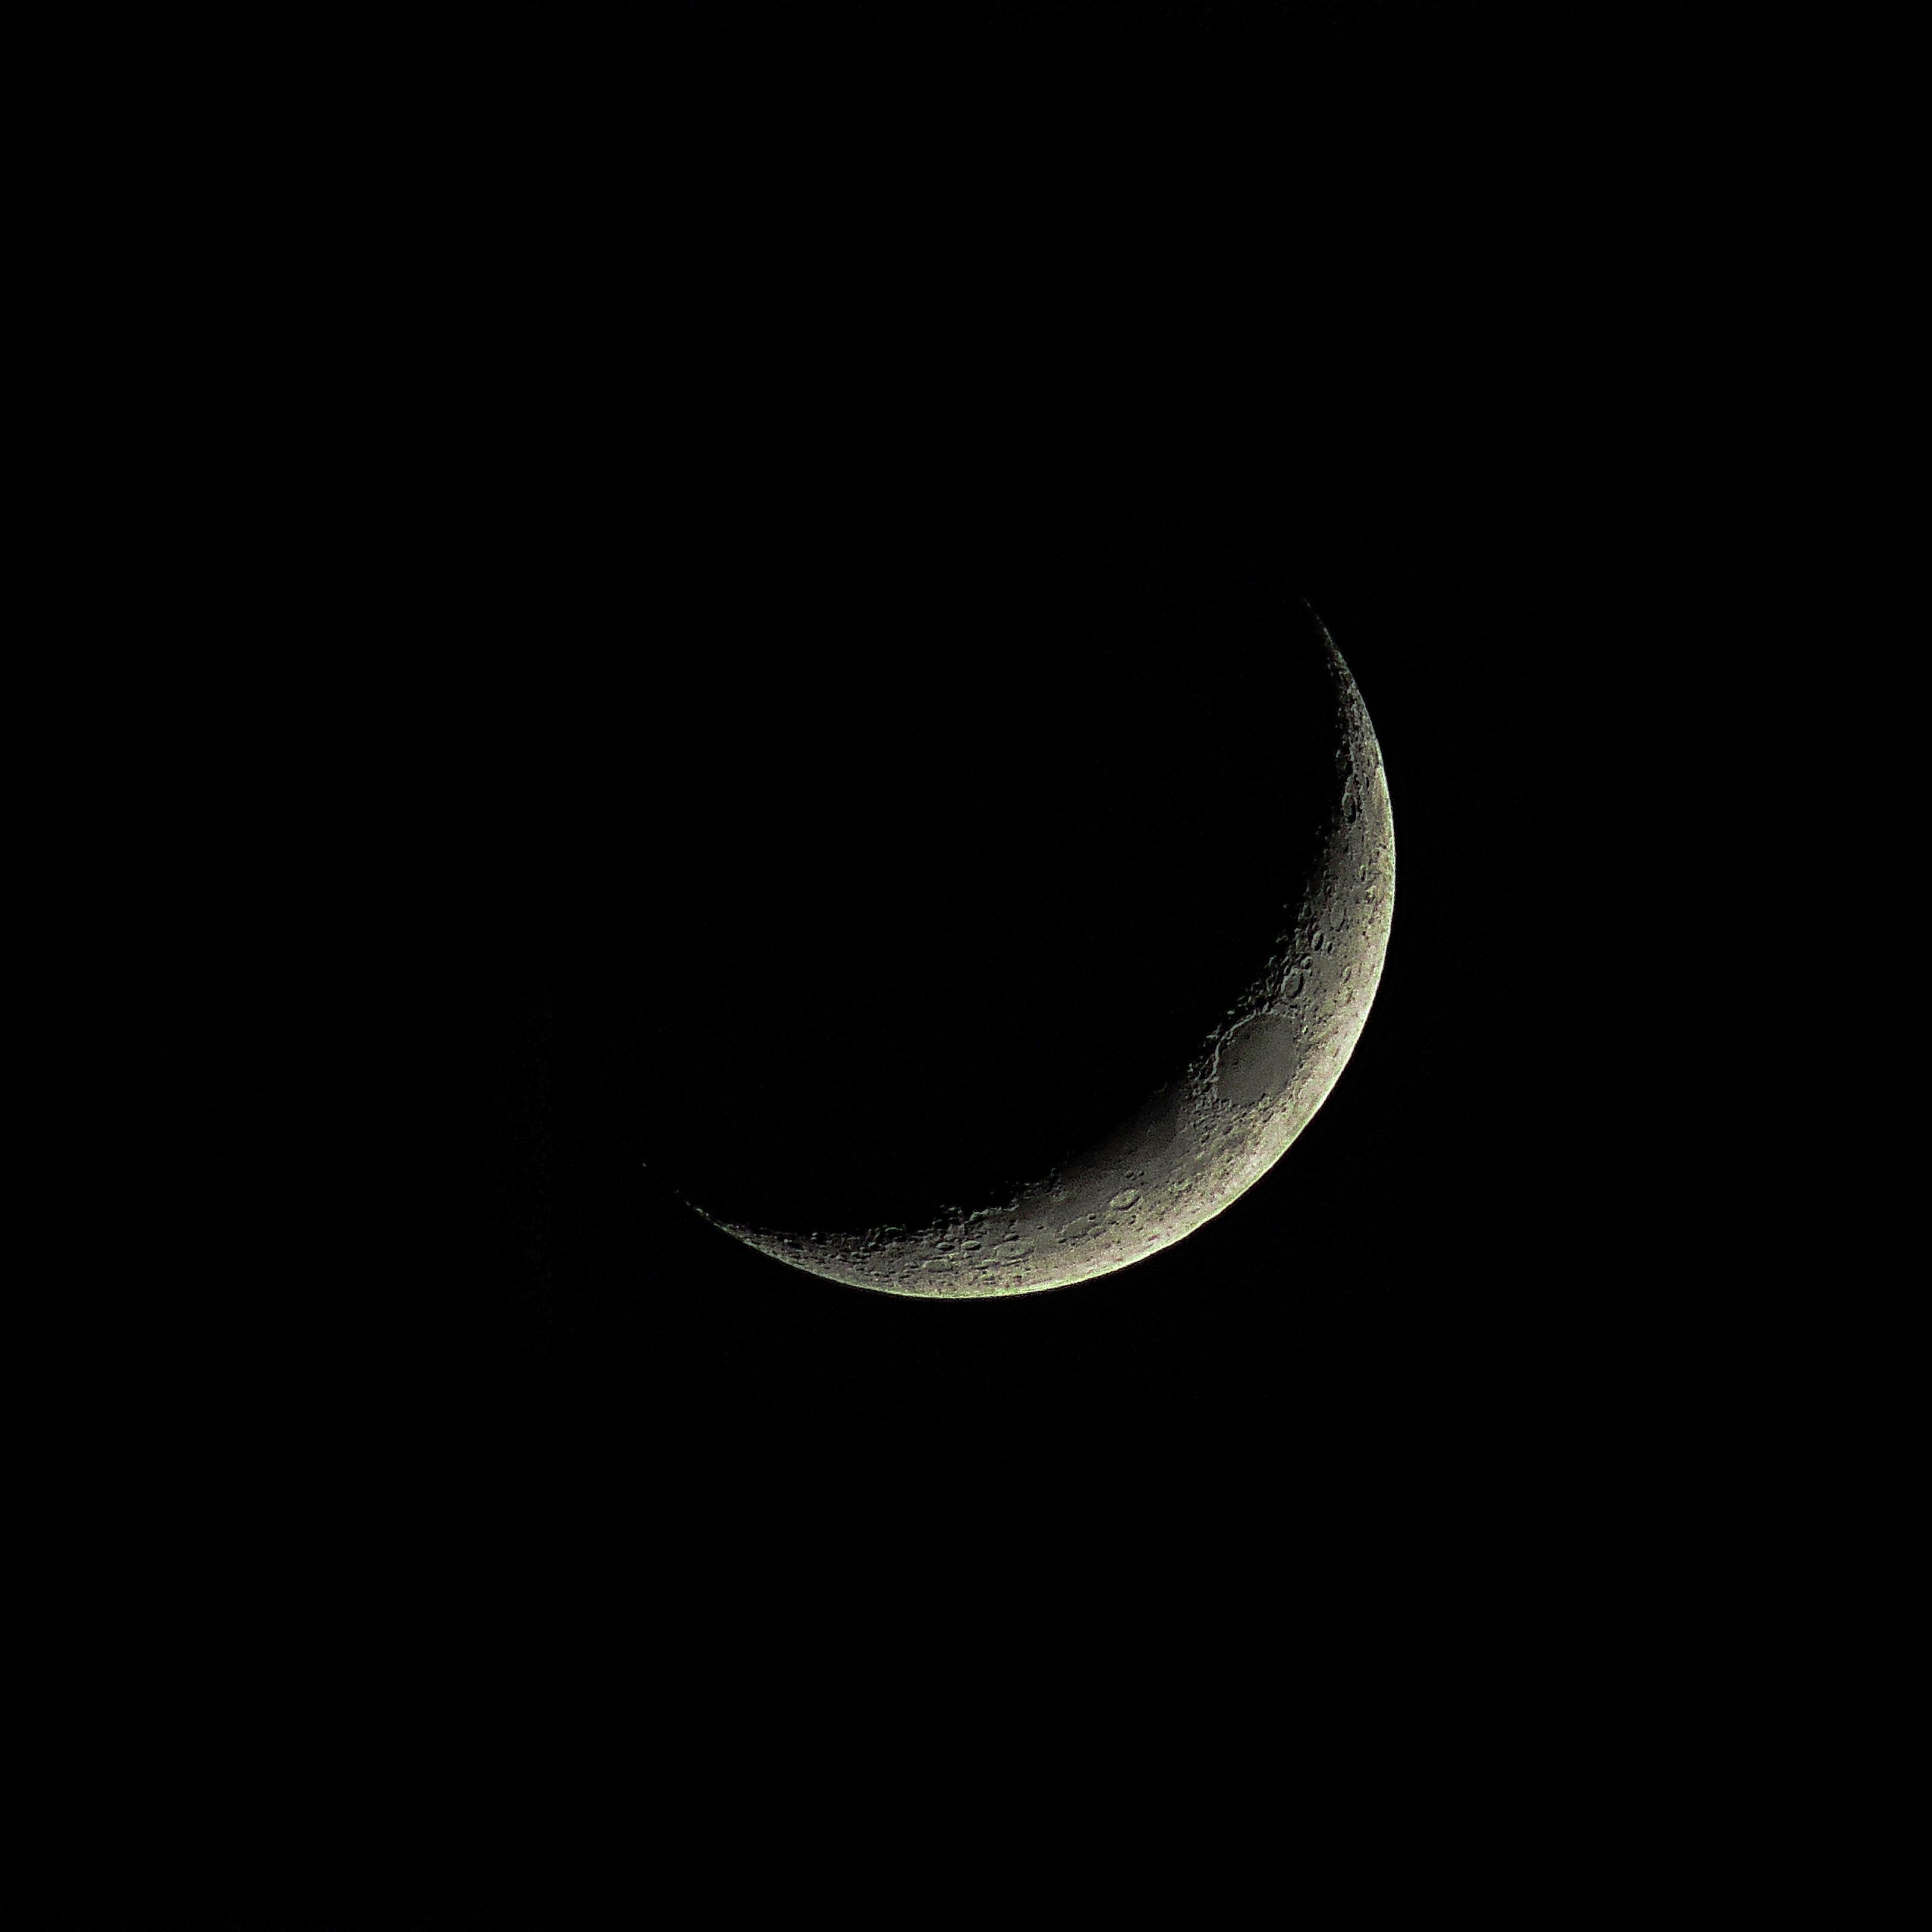 iPad Wallpapers Dark Moon Crescent Luna Space iPad Wallpaper 3208x3208 px